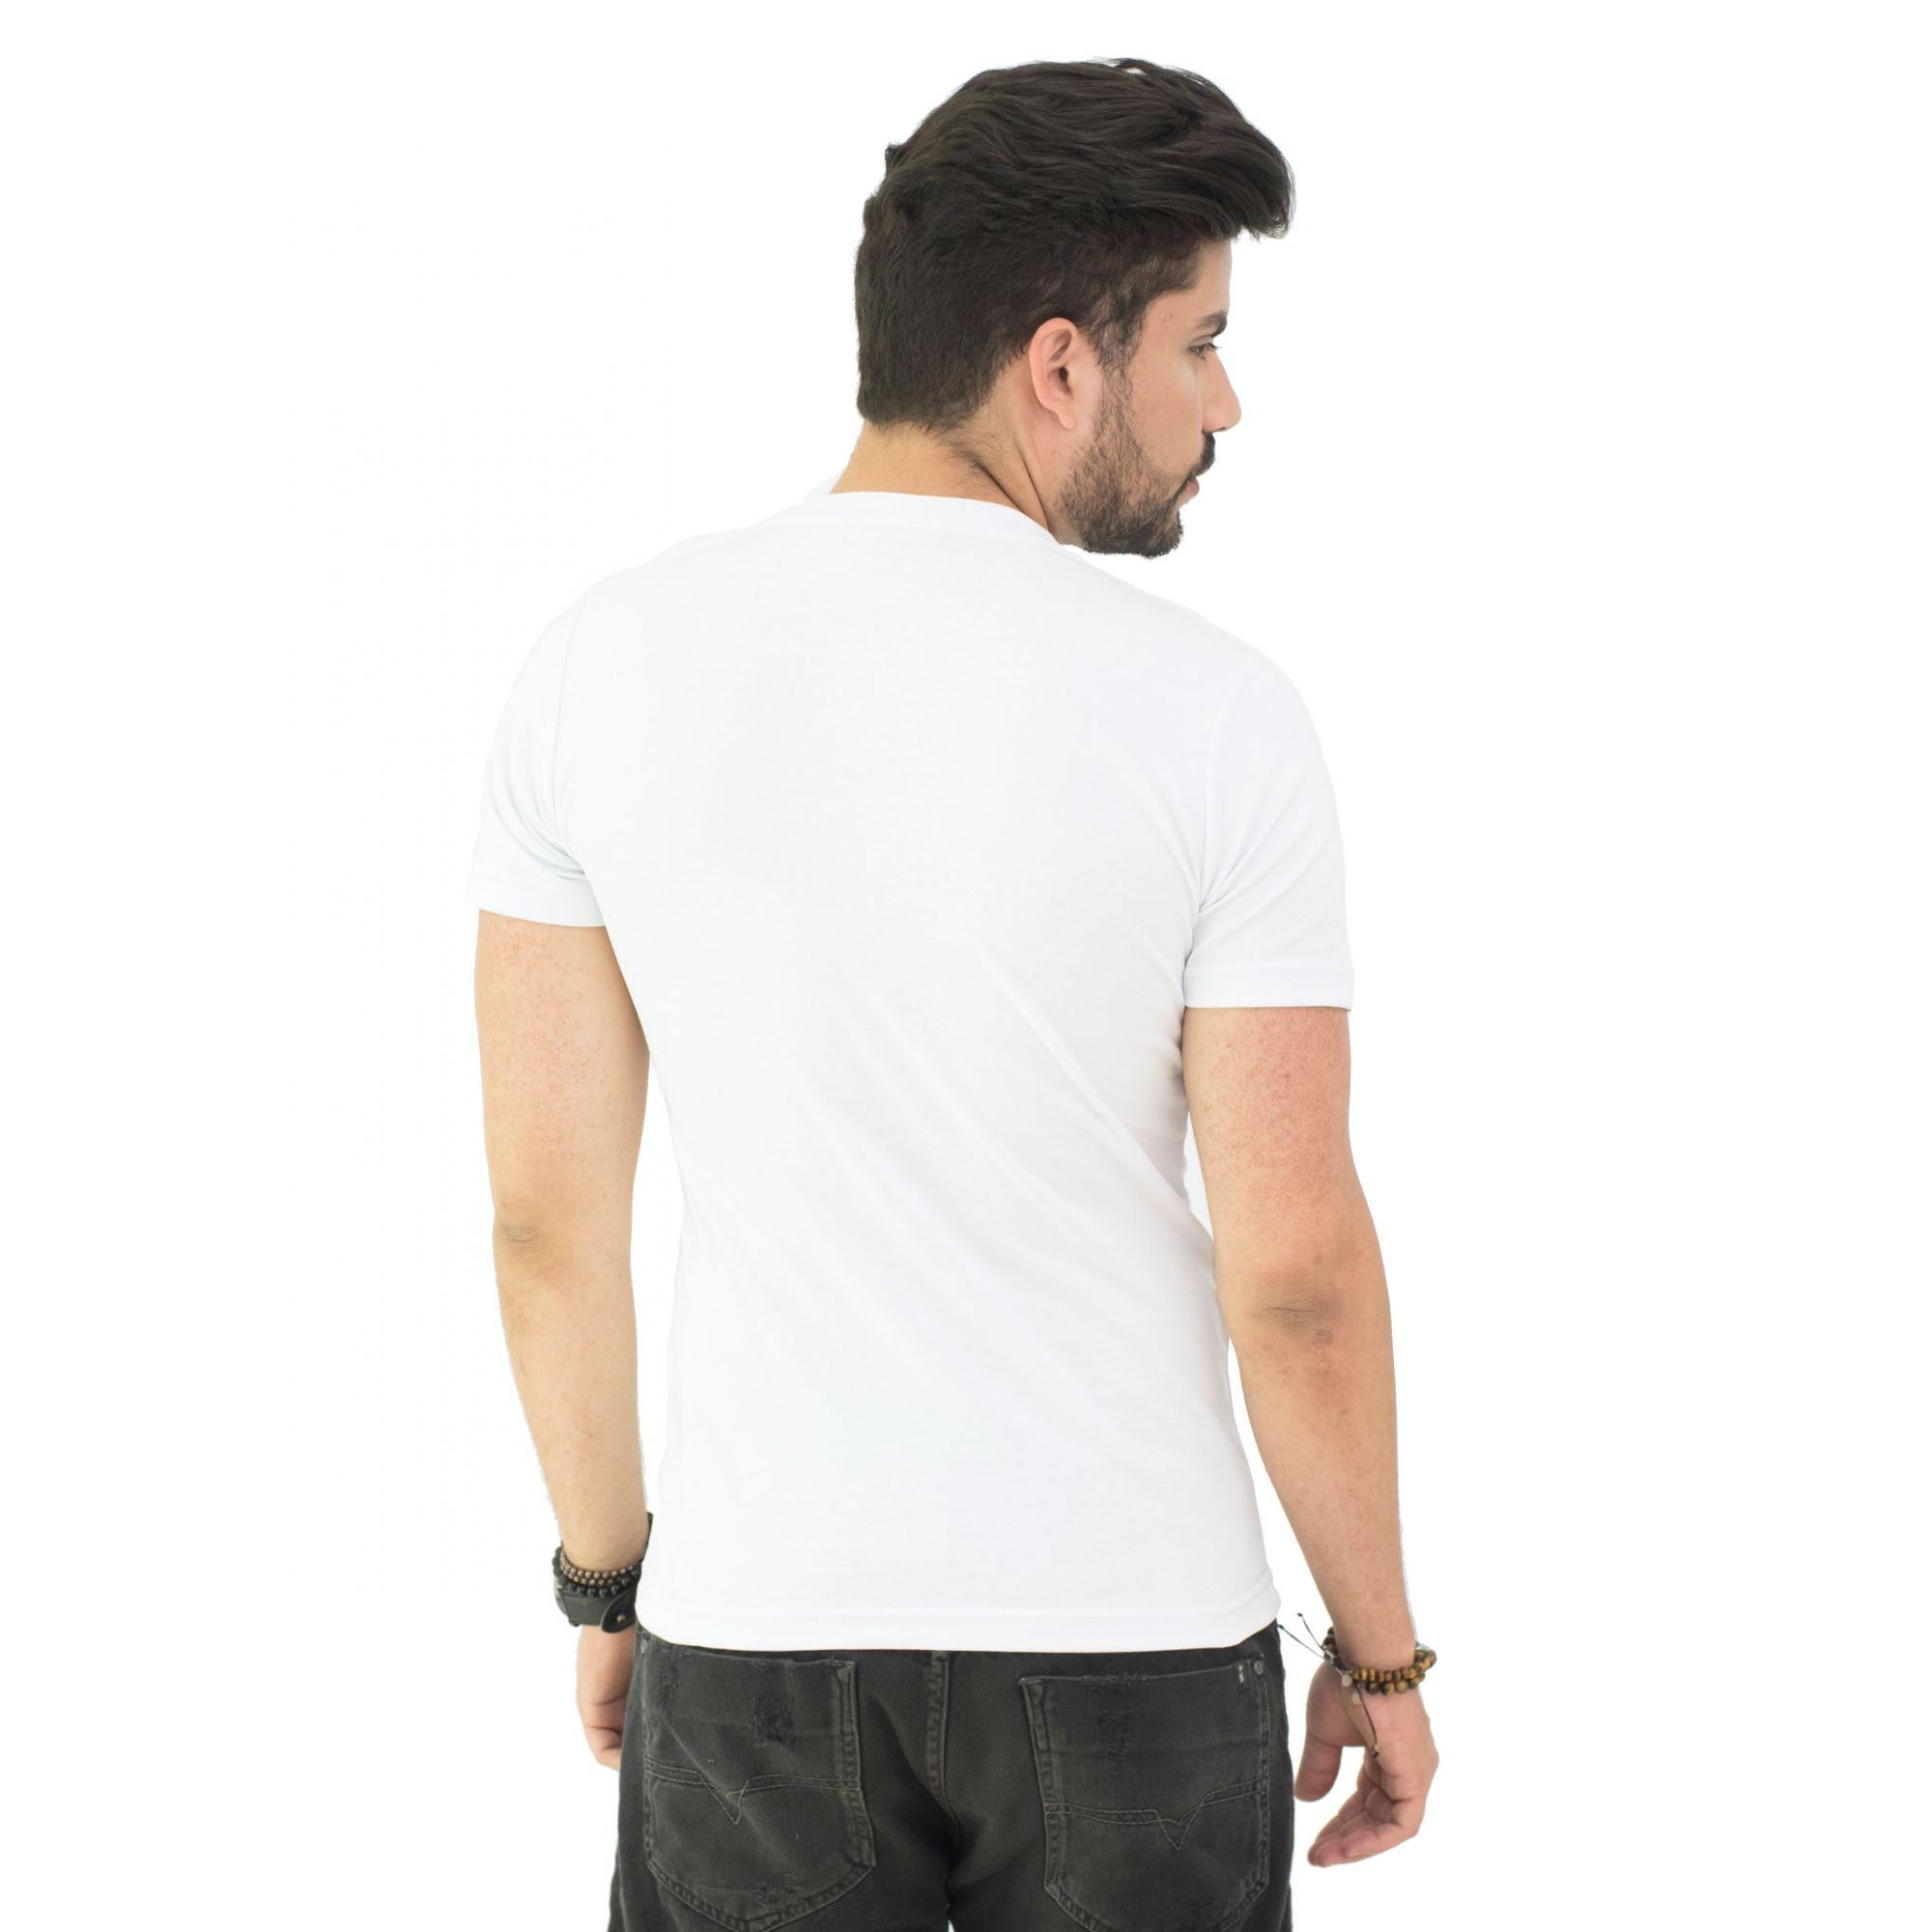 Camiseta Brb-01 Branca SLIM FIT  - Ca Brasileira